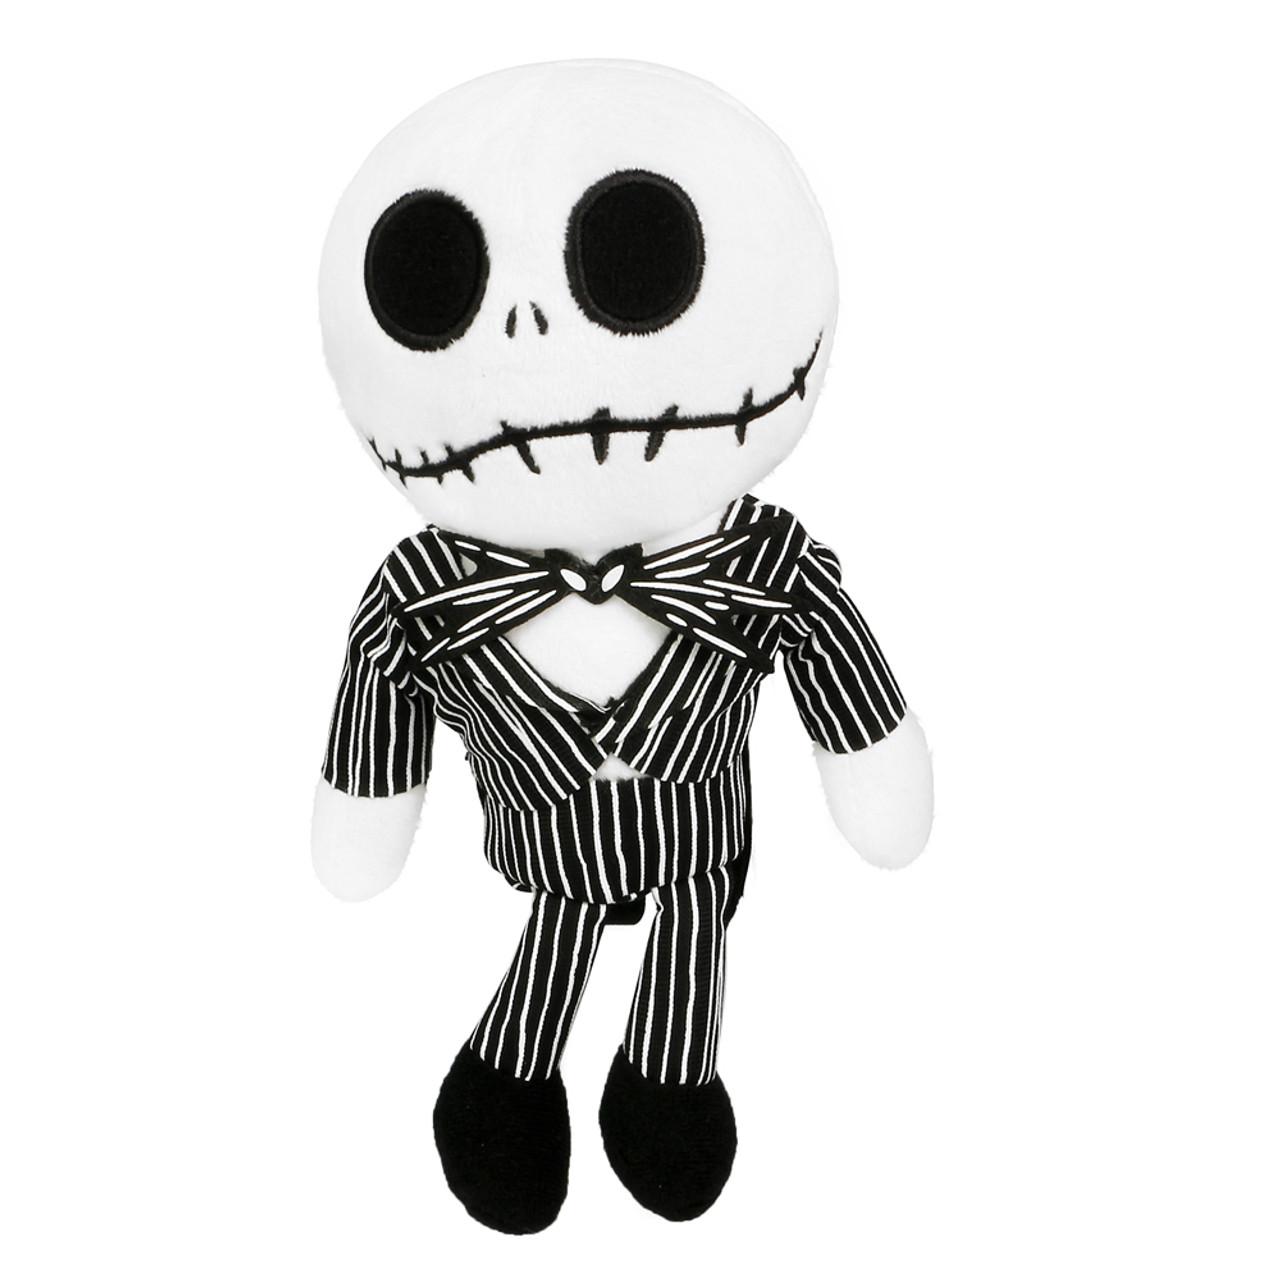 Disney The Nightmare Before Christmas Jack Skellington Plush Doll